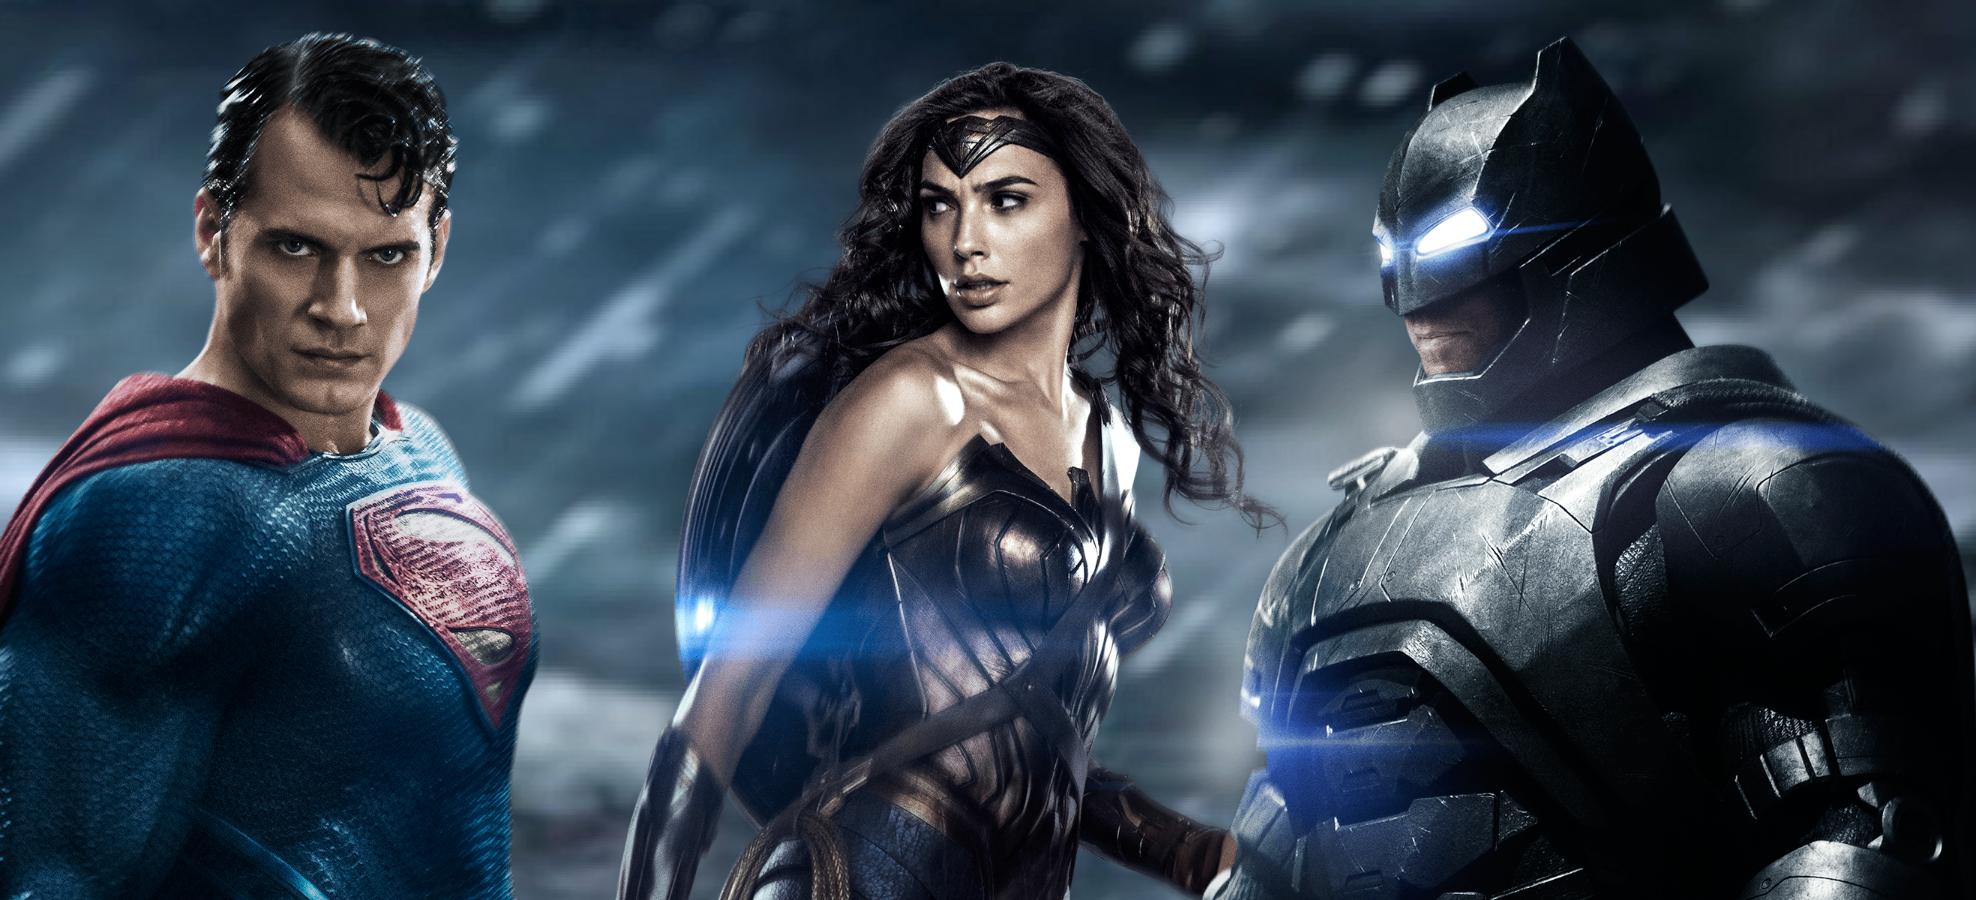 Batman V Superman Dawn Of Justice Wallpaper By Asthonx1